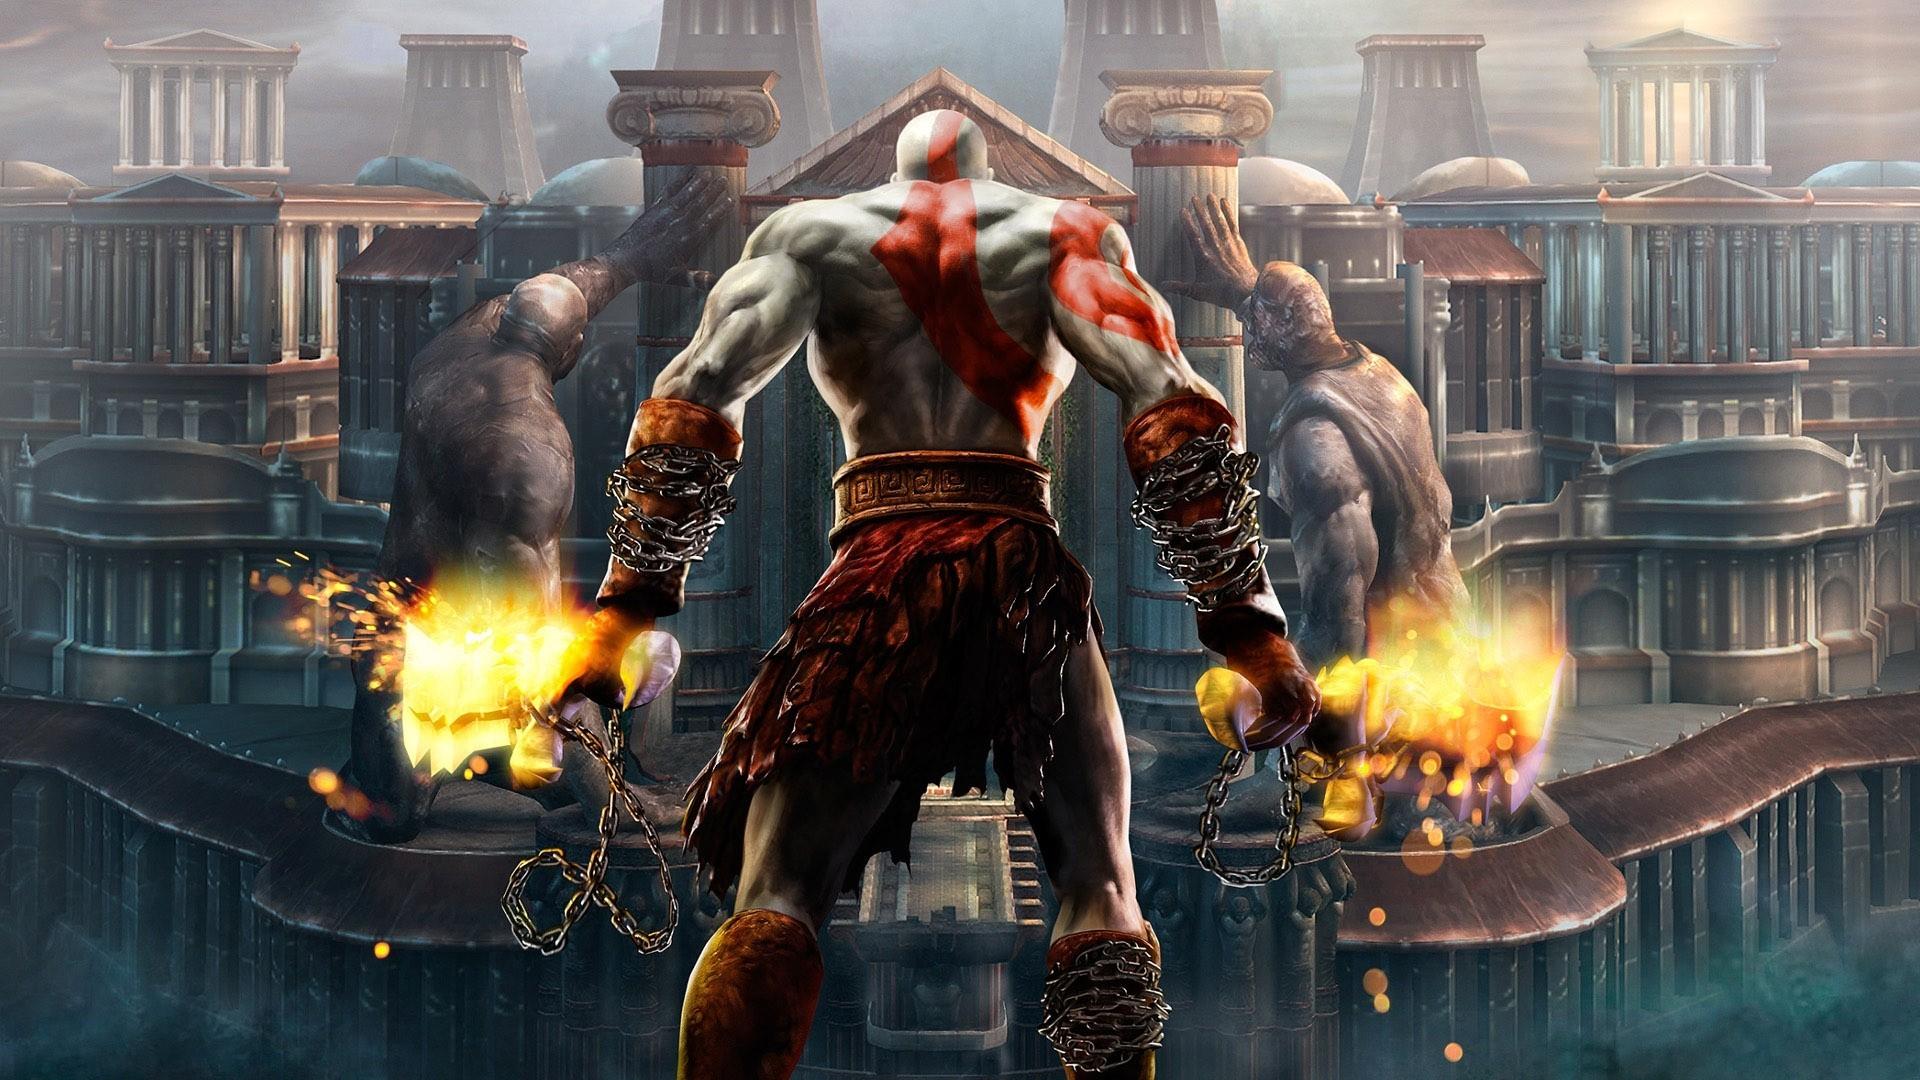 god of war backgrounds A2